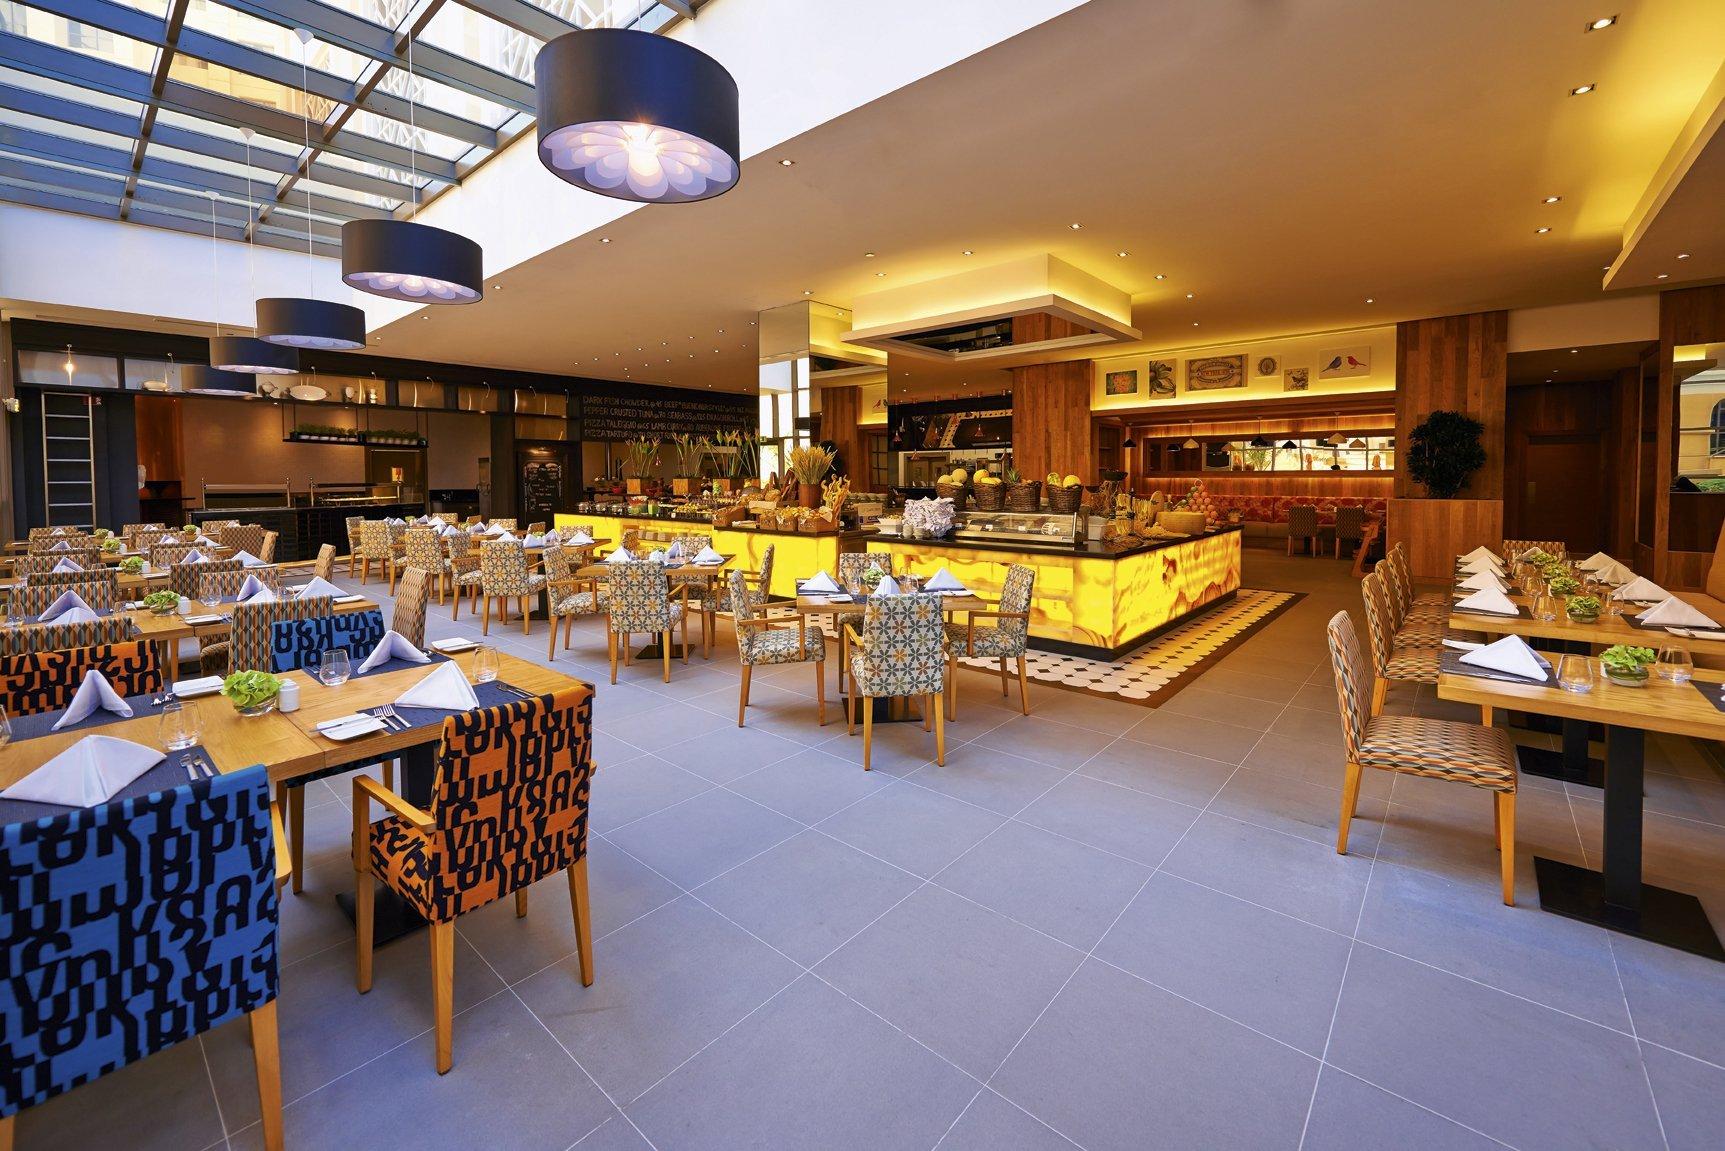 هتل مونپیک جومیراه دبی